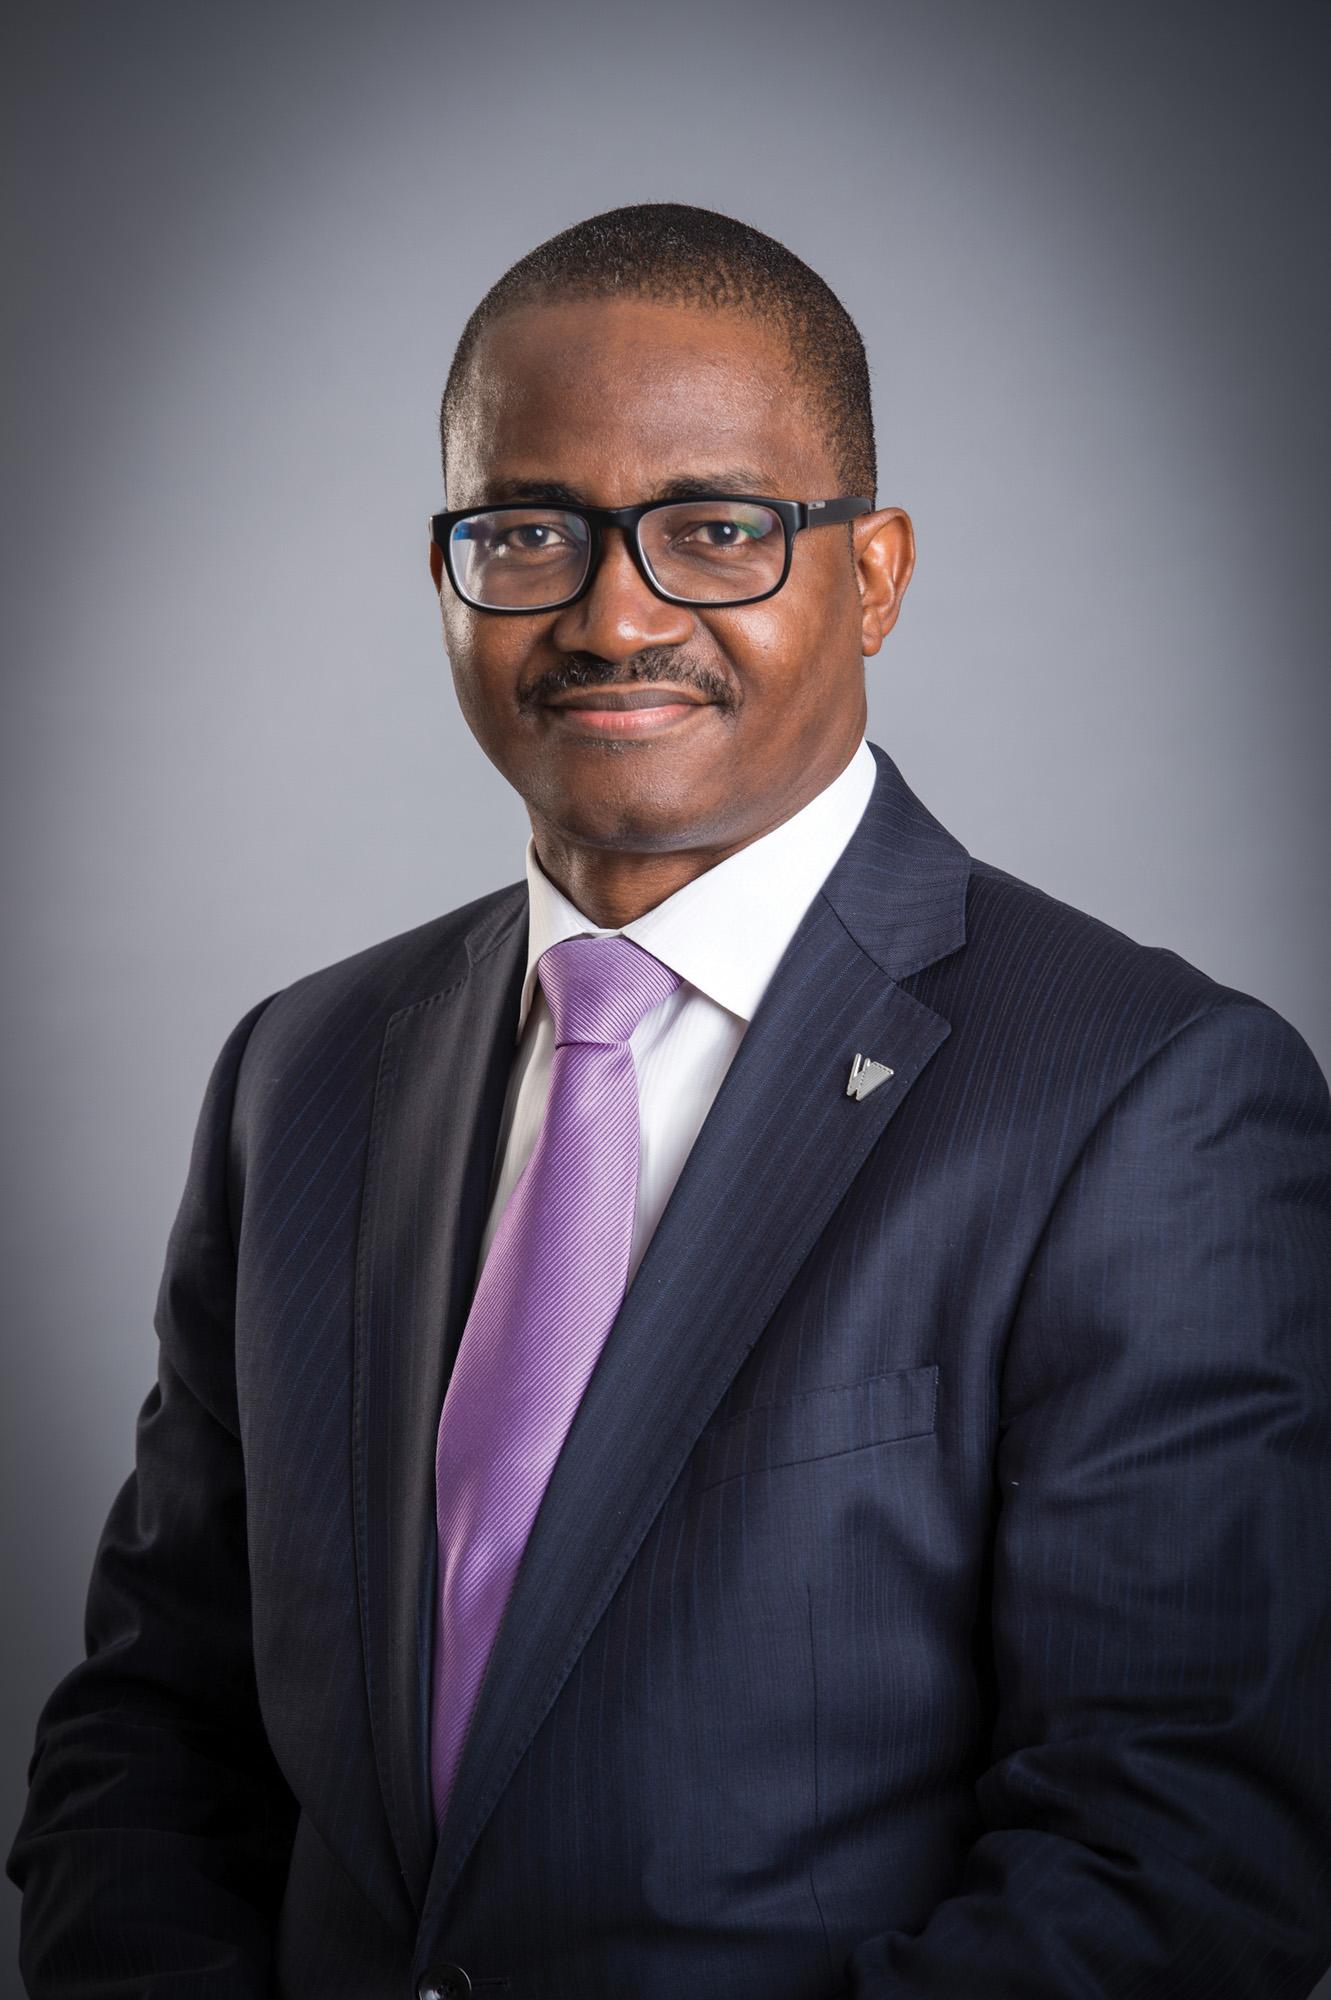 Figures Don't Lie Wema Bank Standing On Strong Financial Fundamentals – Adebise Brandnewsday